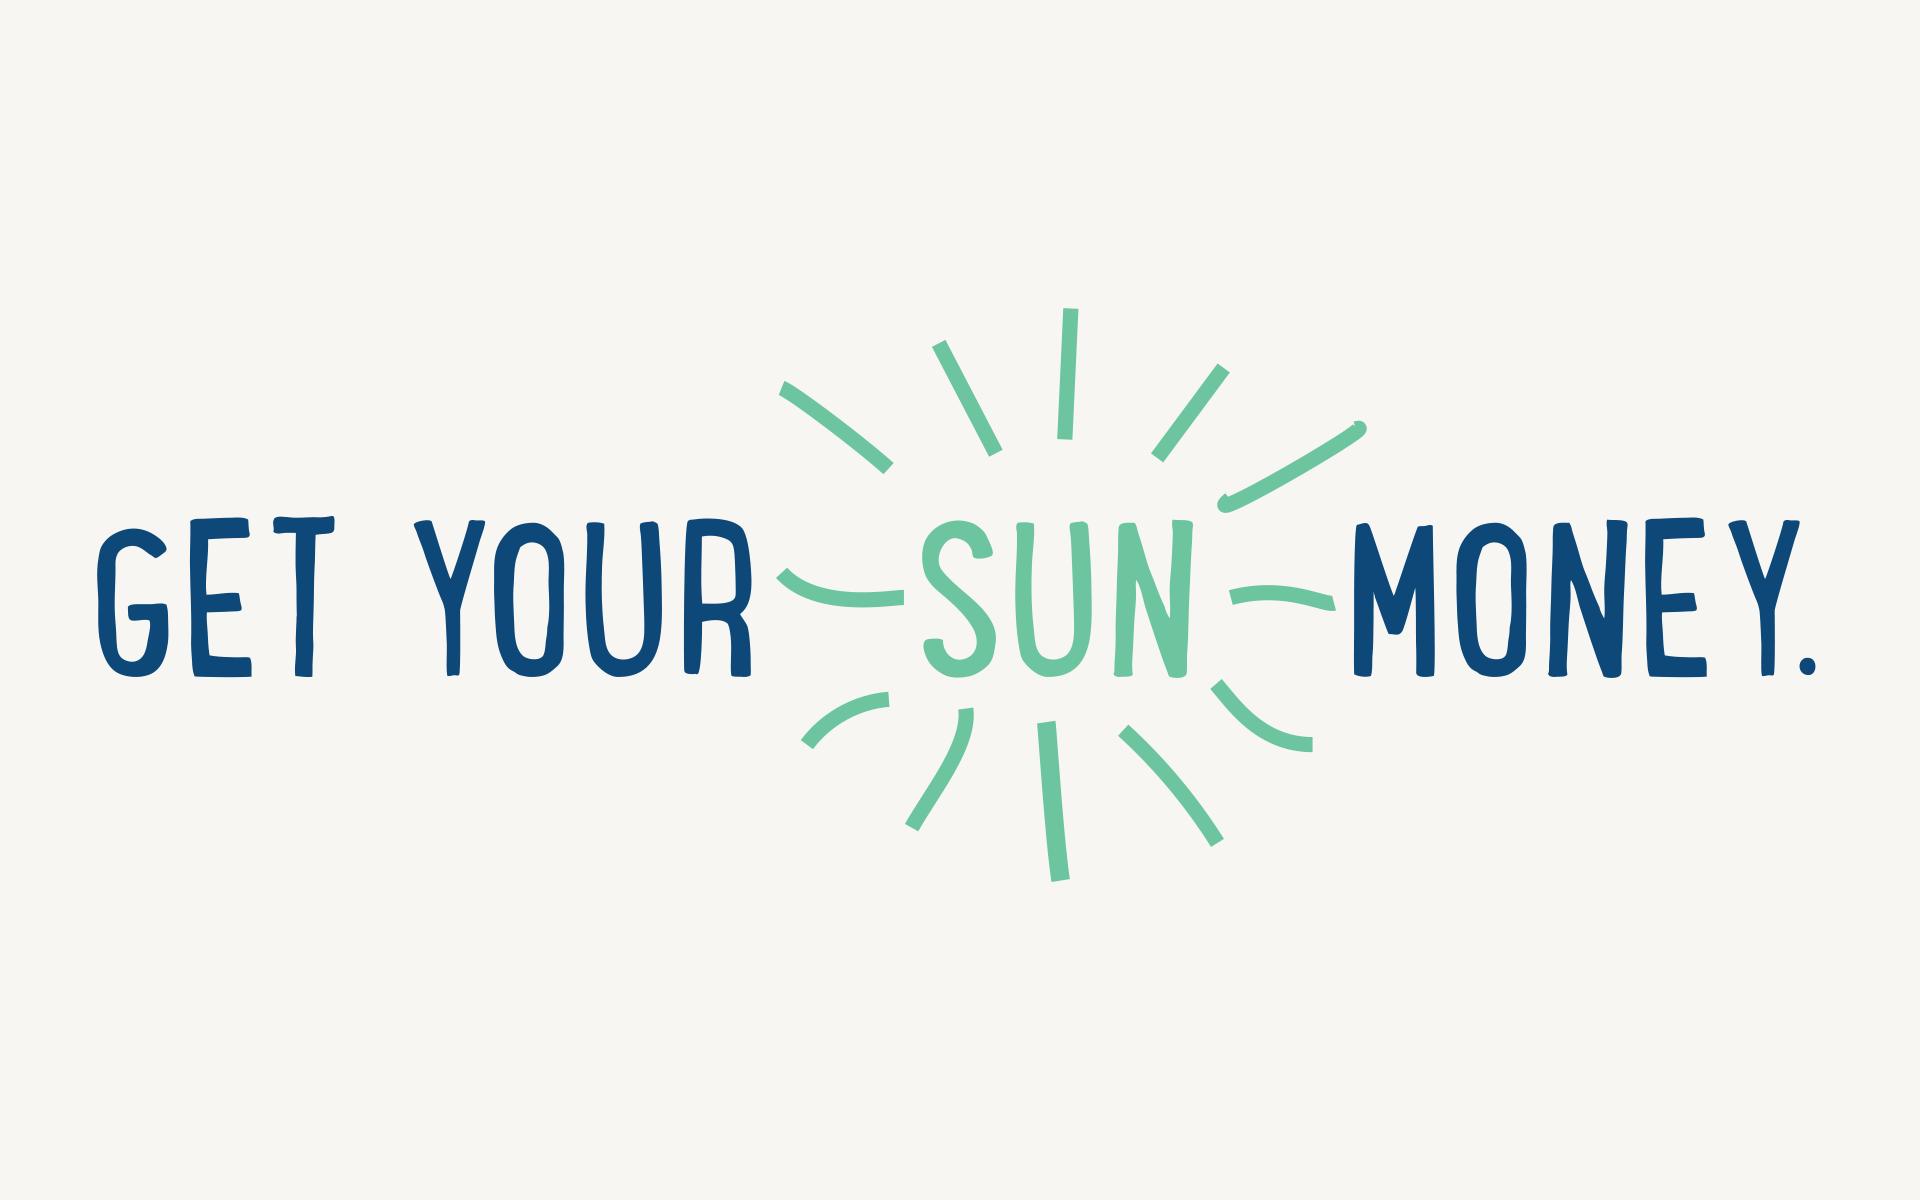 Get your sun money